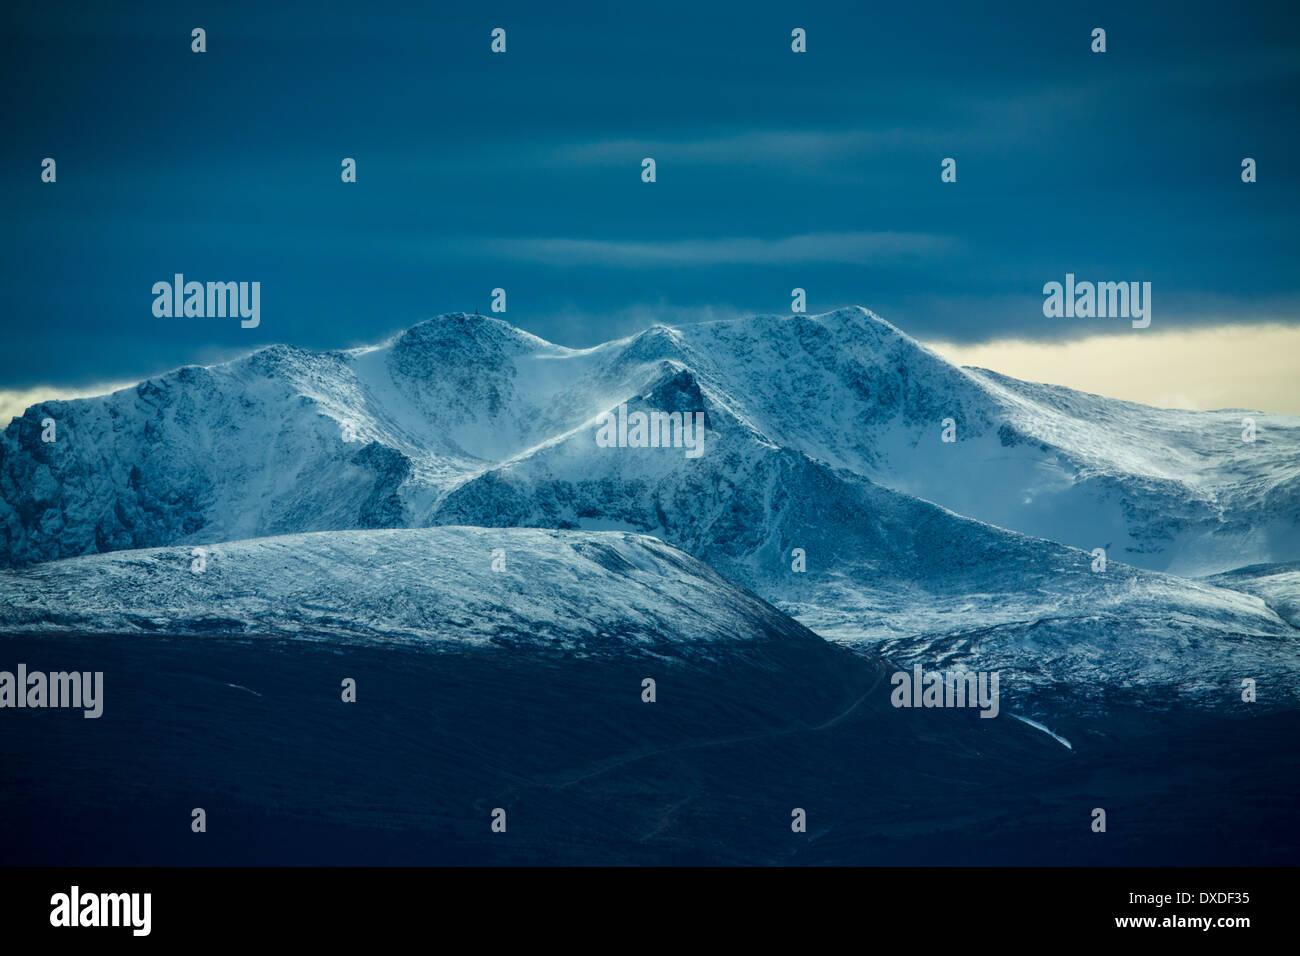 Montana-Berg, nr Carcross, Yukon Territorien, Kanada Stockbild